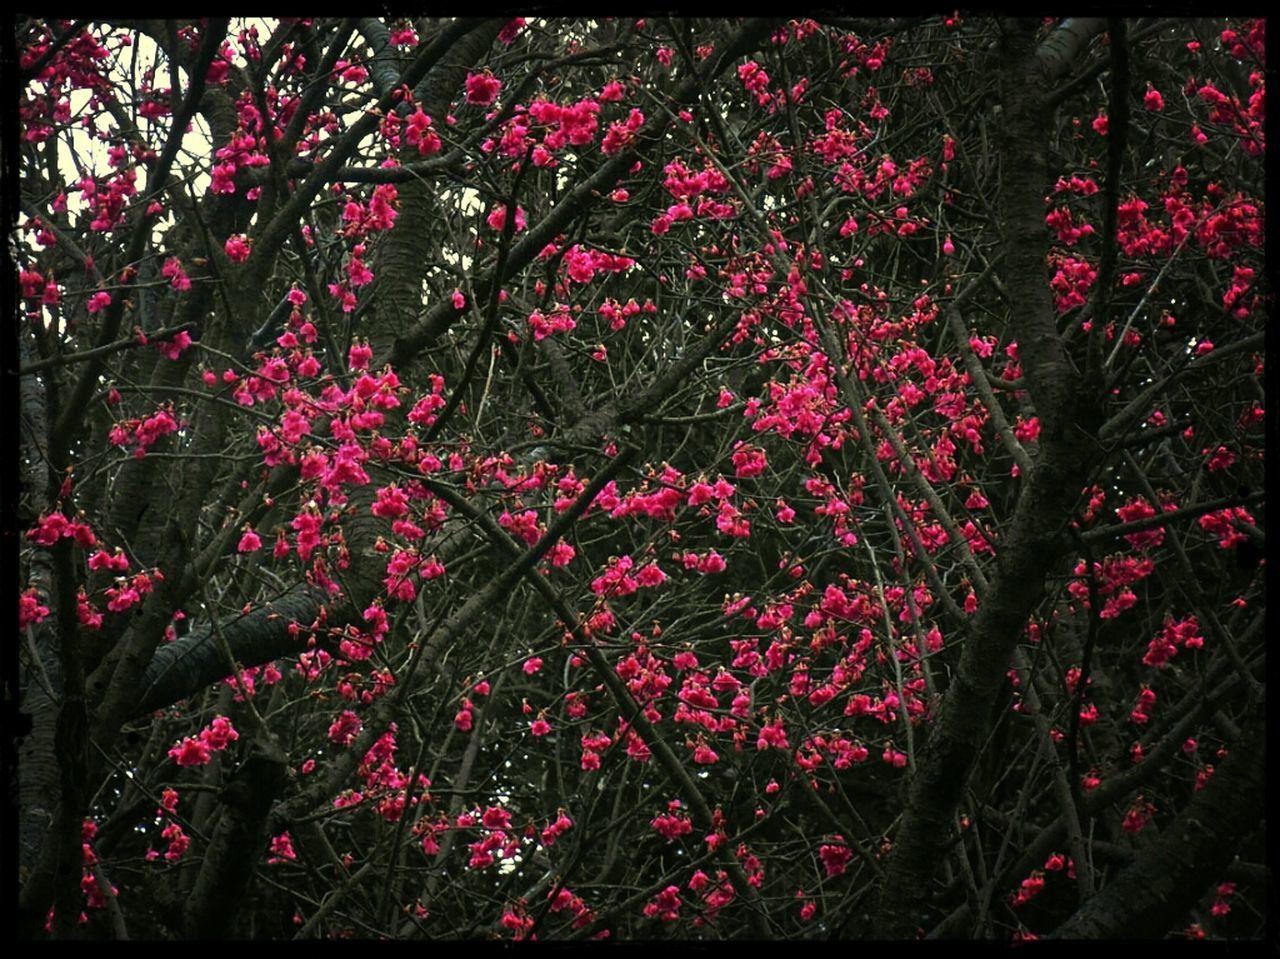 botanical, red, foliage, shrub, spring, blossom, vegetation, colorful, bush, garden, summer, botany, green, flower, growth, railing, no people